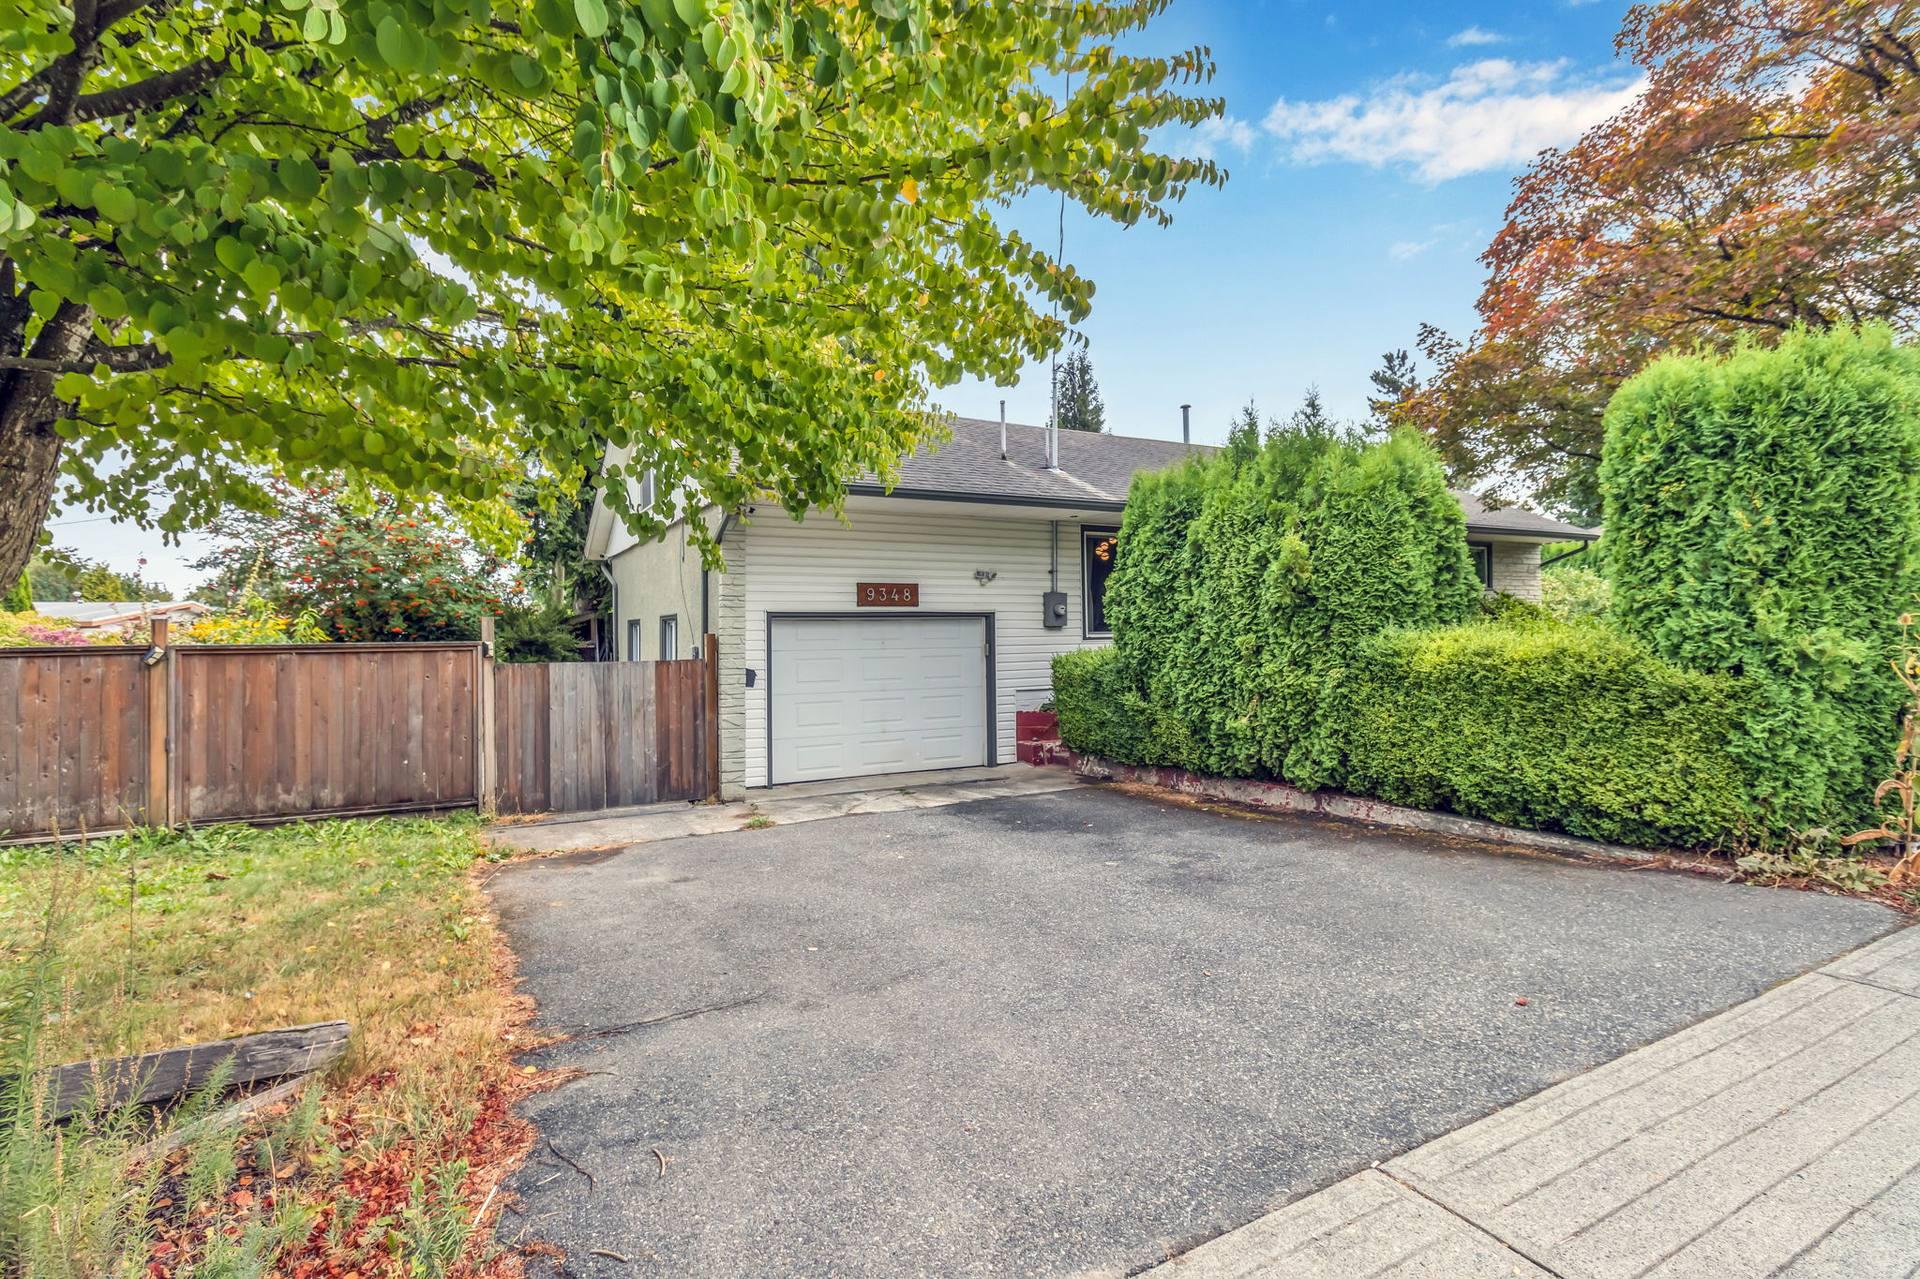 9348 Ashwell Rd, Chilliwack, BC V2P 3W2, Canada